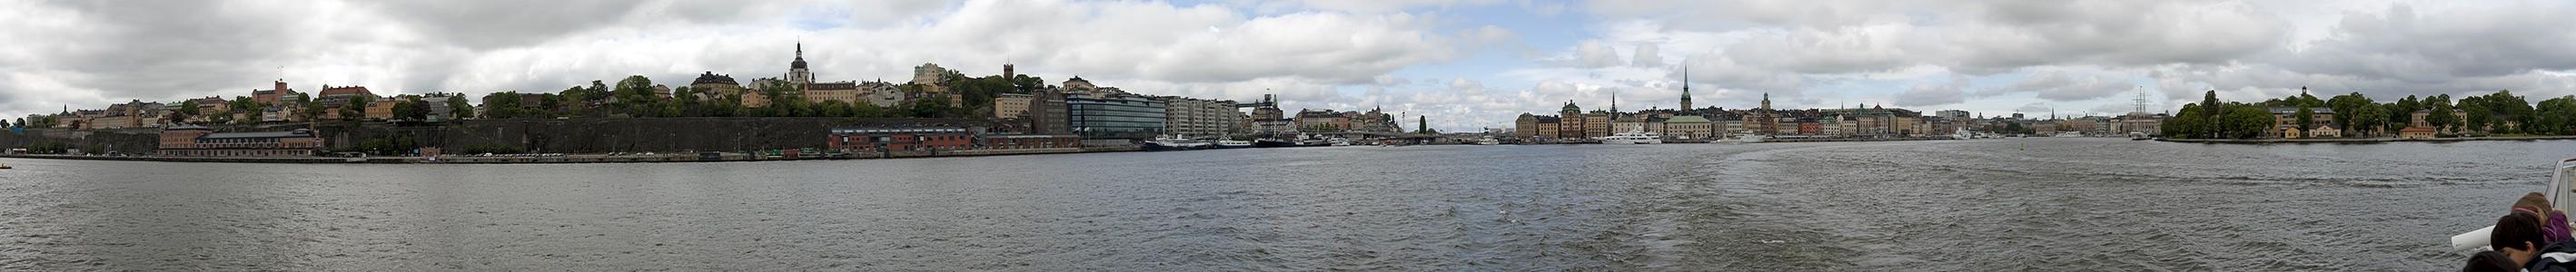 Fähre Stockholm - Vaxholm: Saltsjön Gamla stan Katharinenkirche Skeppsholmen Södermalm